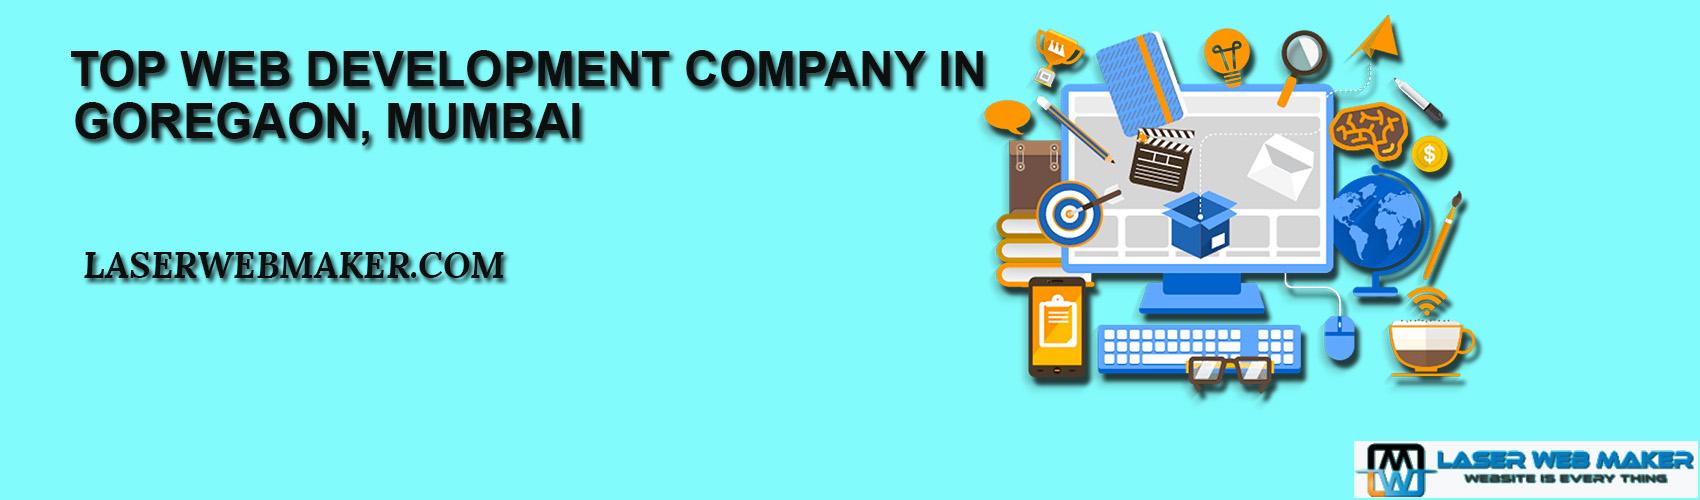 Top Web Development Company In Goregaon, Mumbai